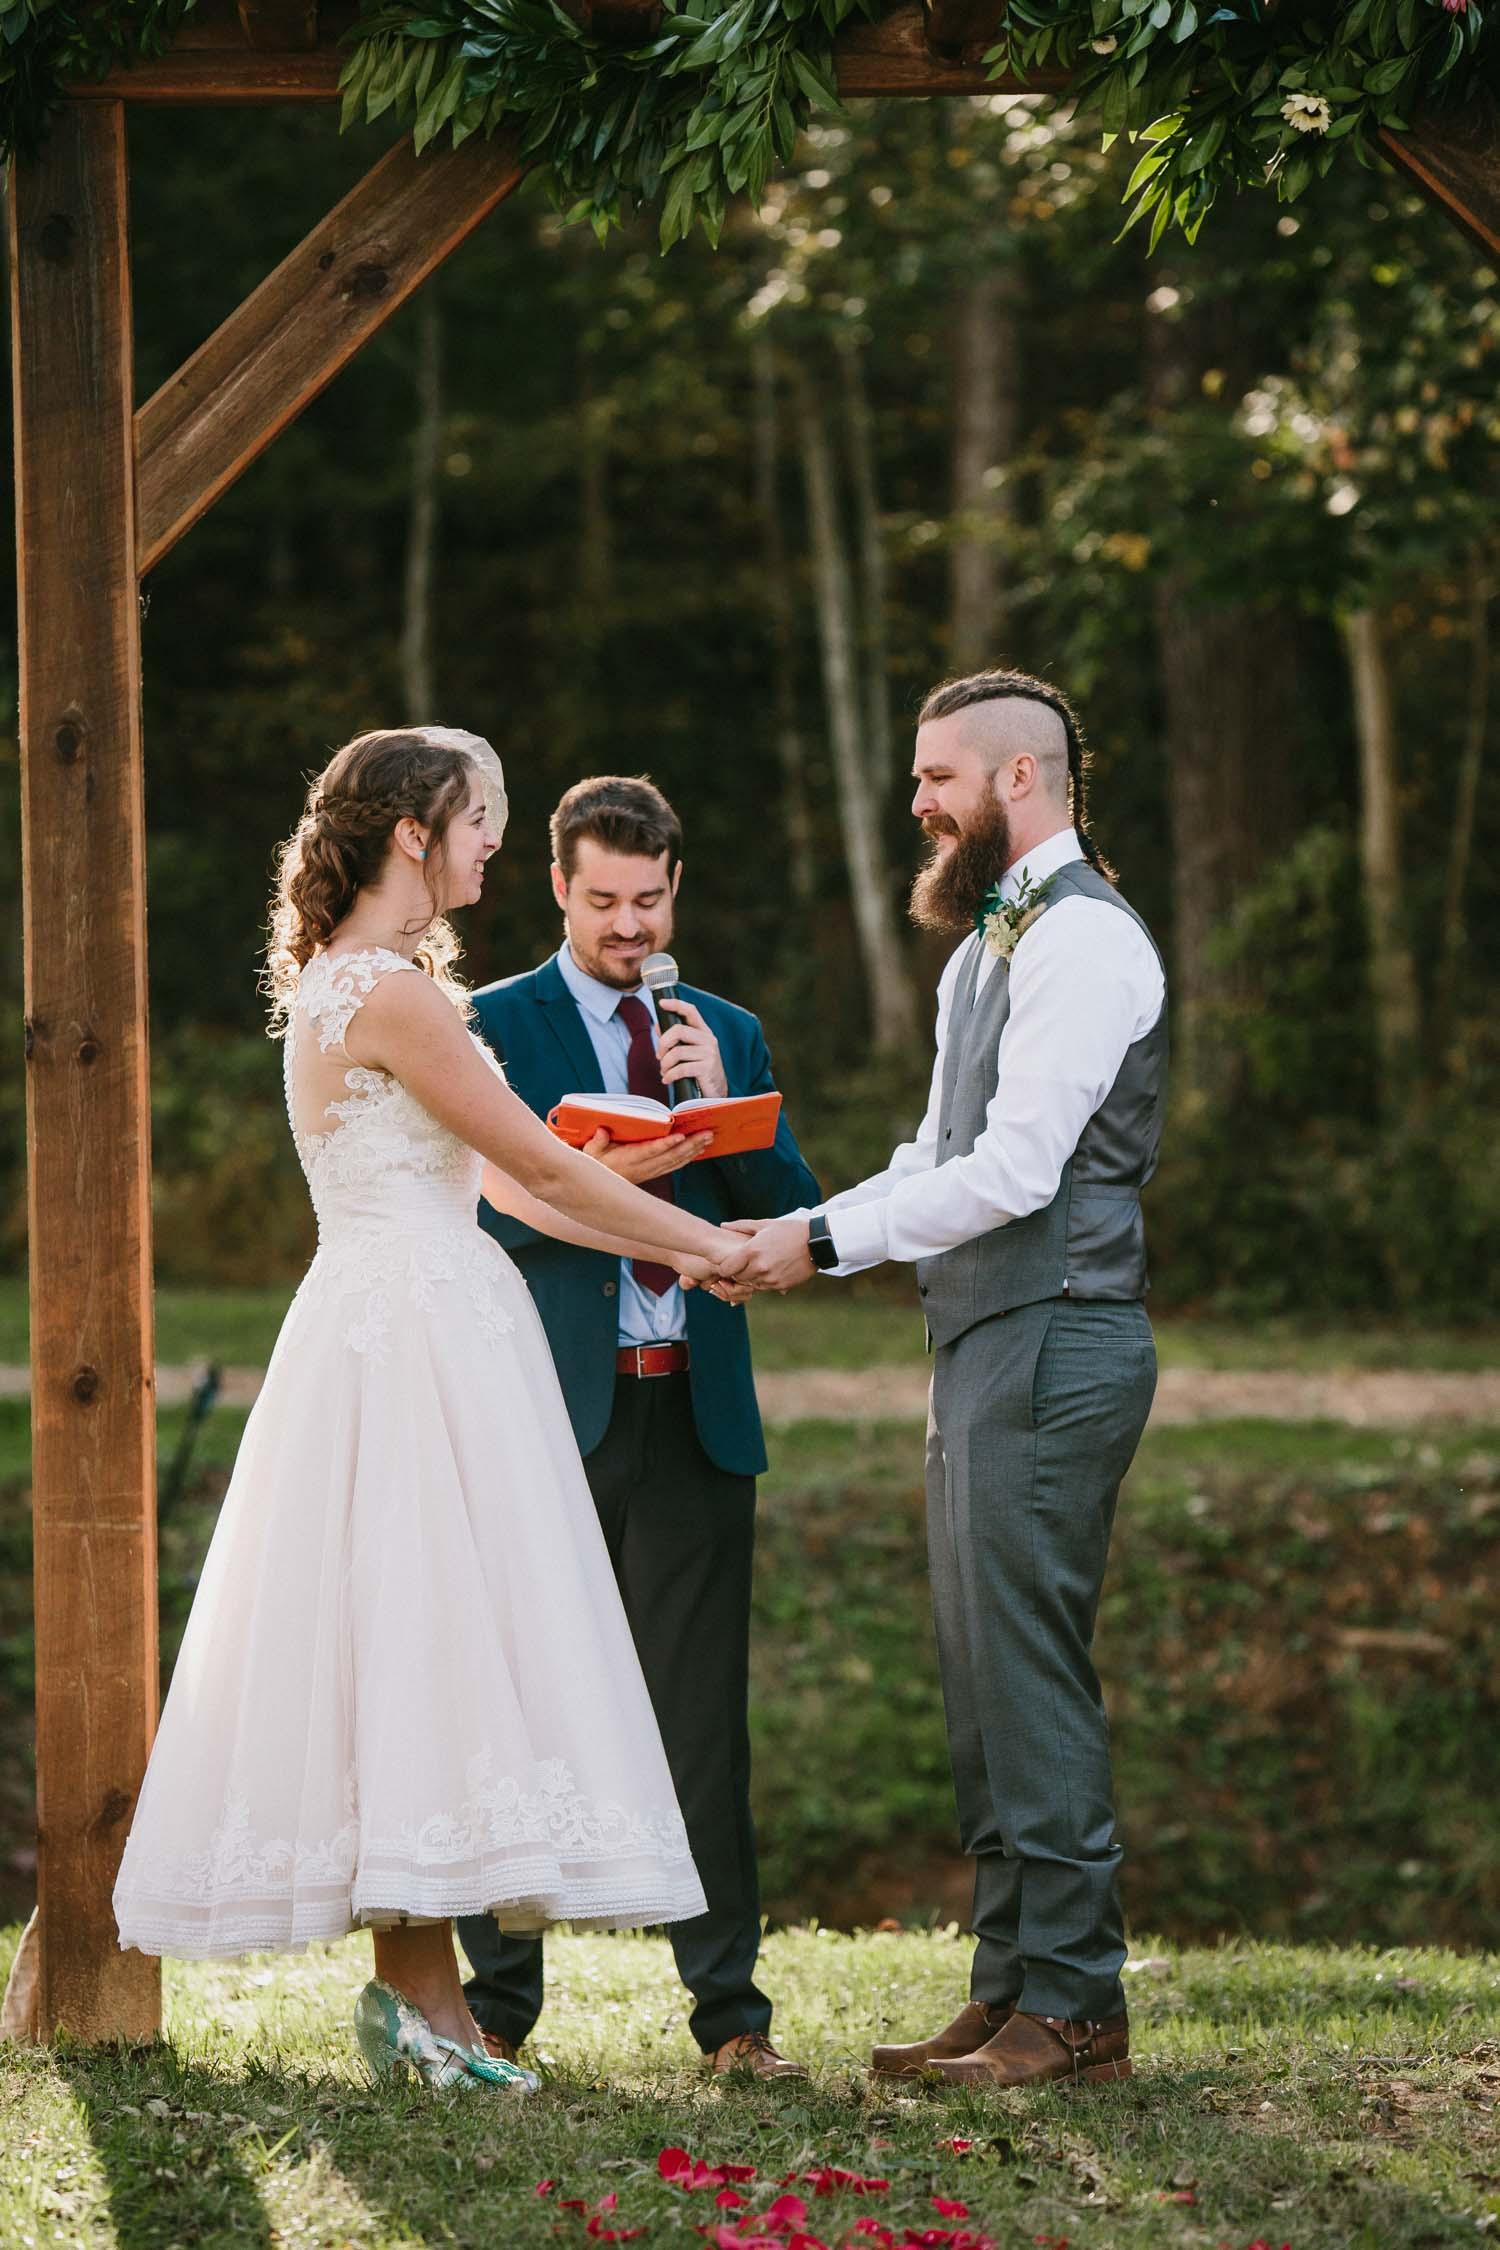 Angeli_Joe__Asheville_Wedding-46.jpg